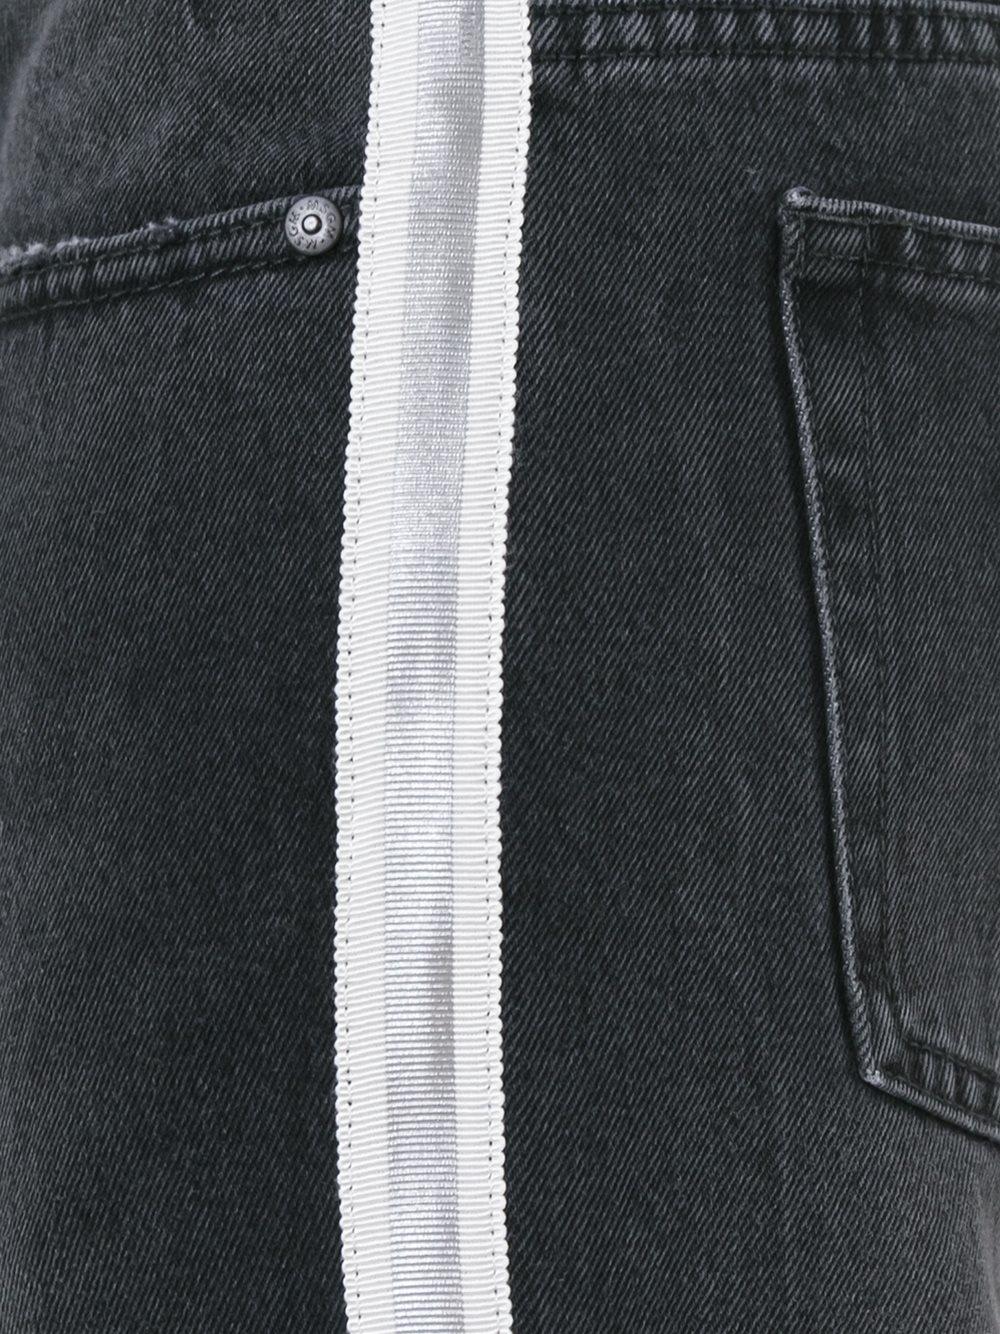 Msgm Side Stripe Jeans In Gray For Men Lyst